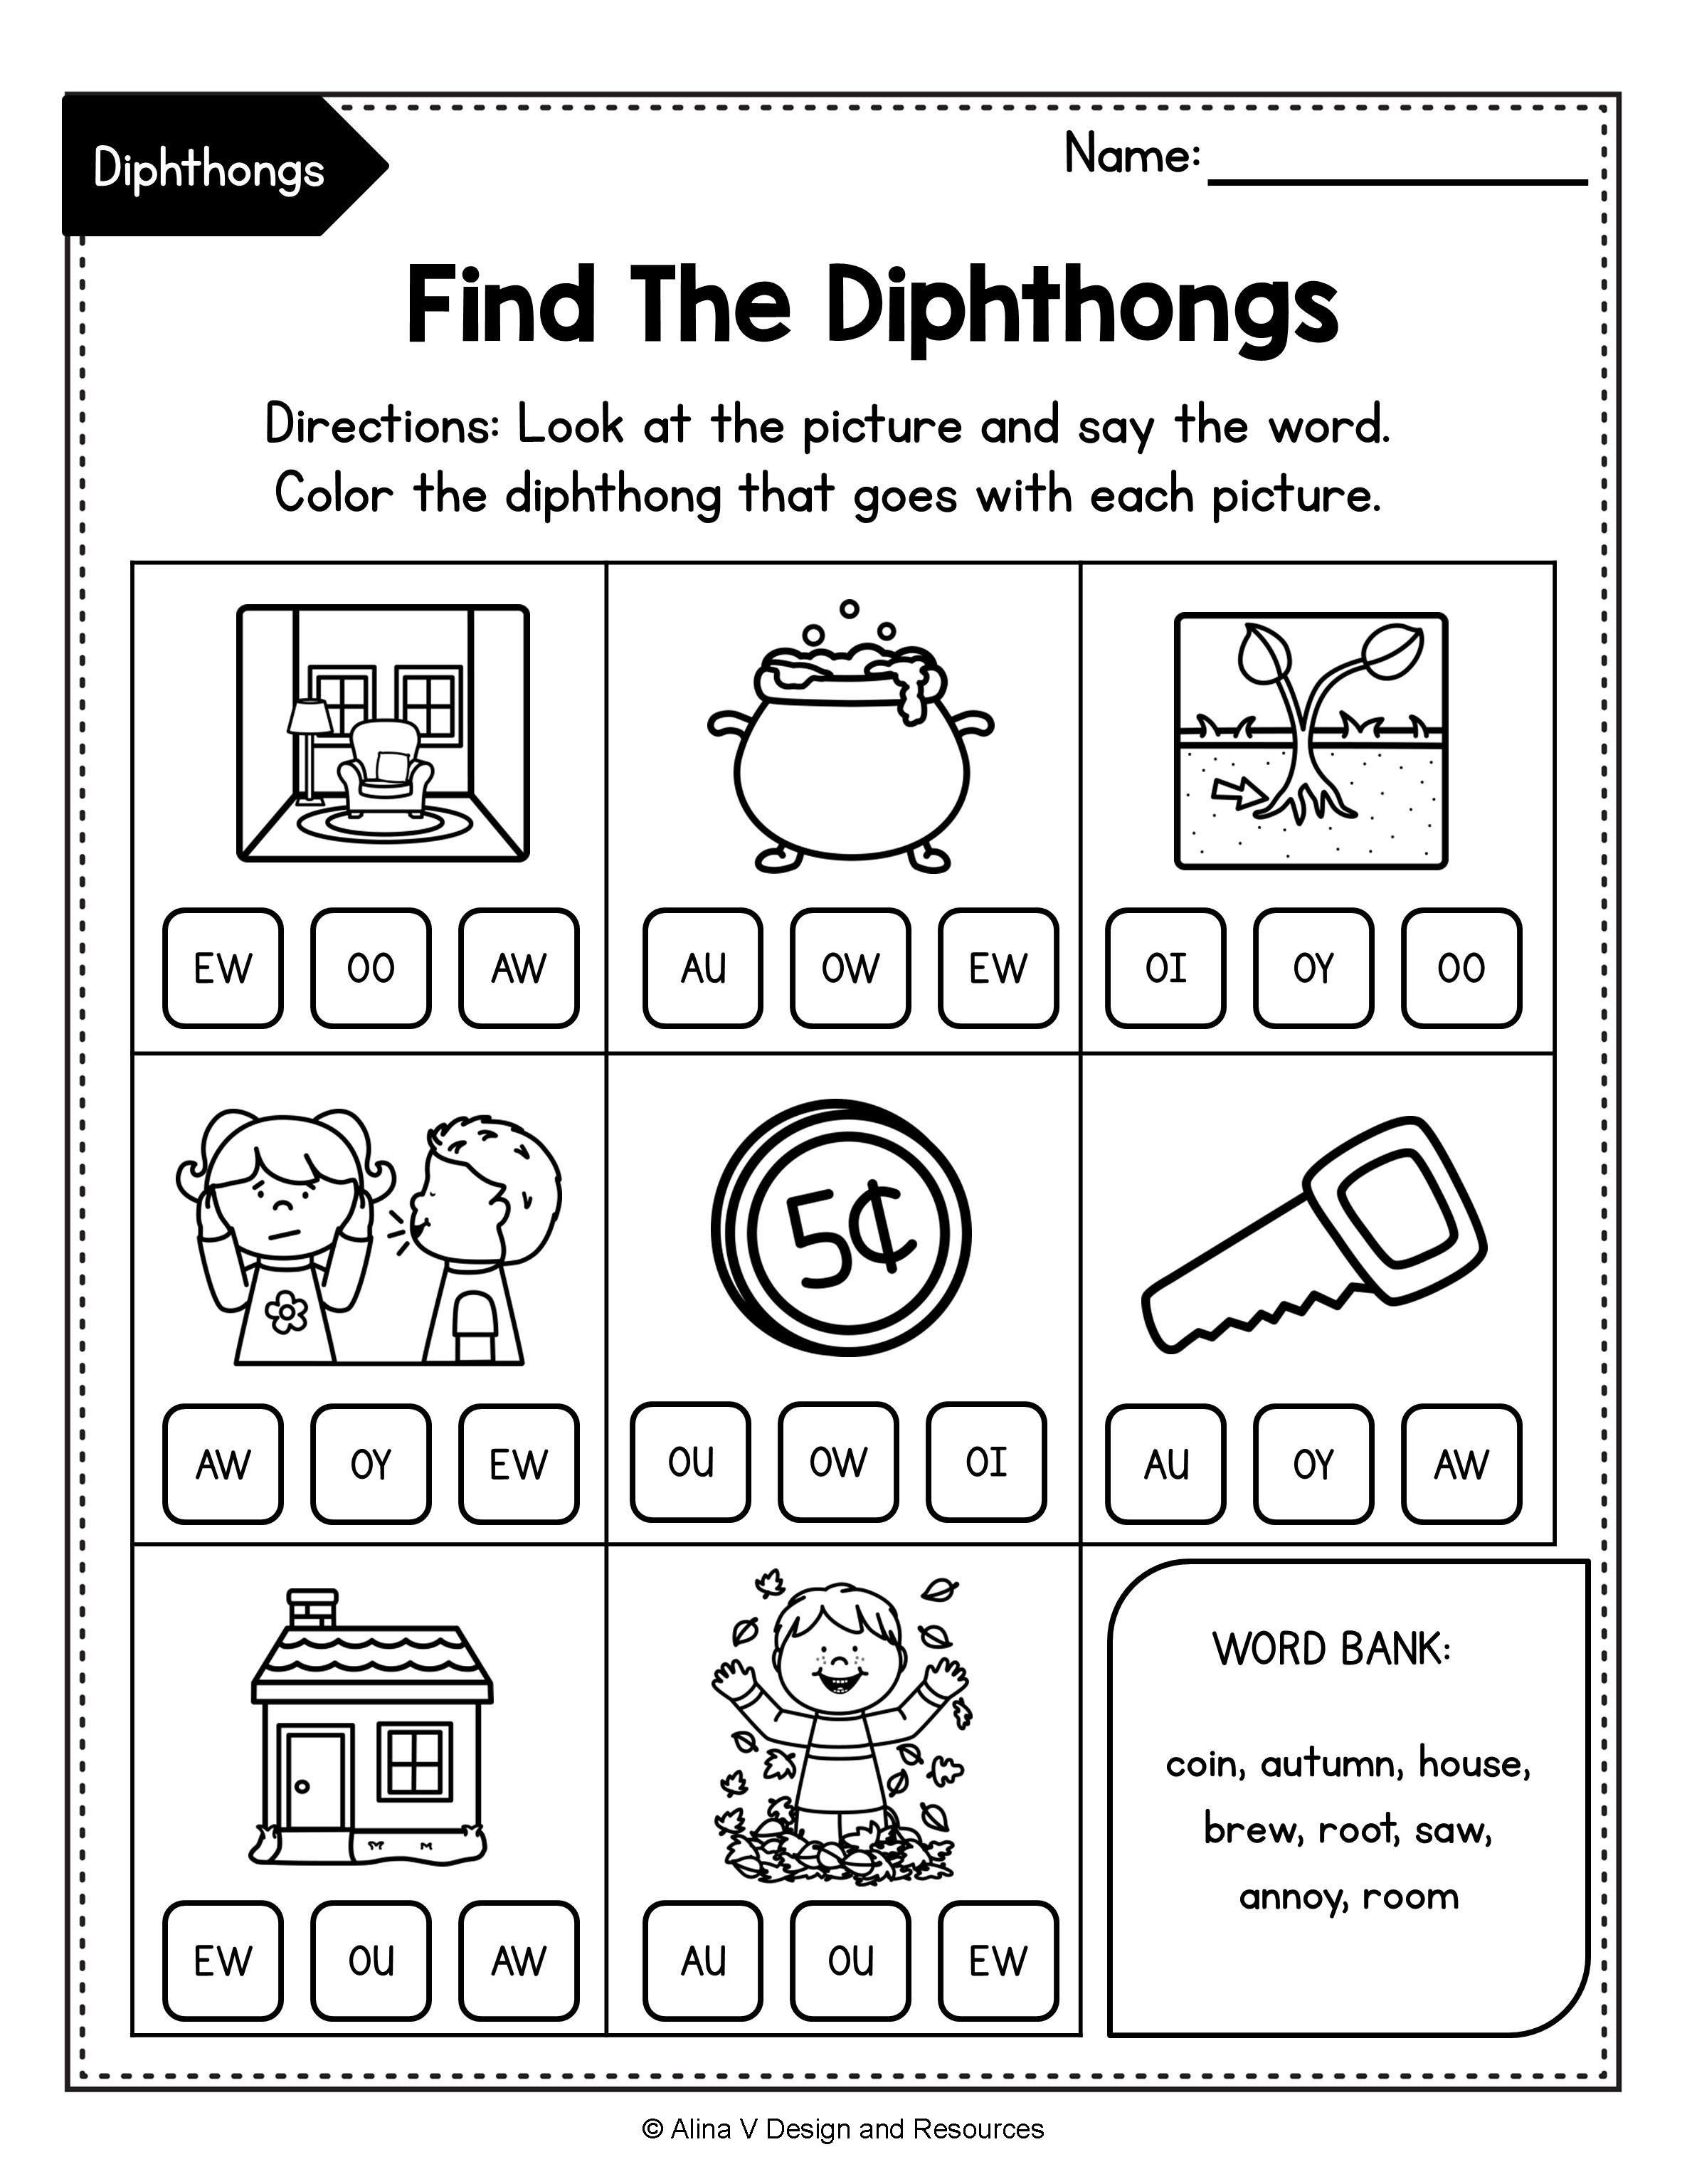 Diphthong Activities Bundle Diphthong Activities Vowel Diphthongs Worksheets In 2020 Phonics Activities Phonics Kindergarten Teaching Vowels